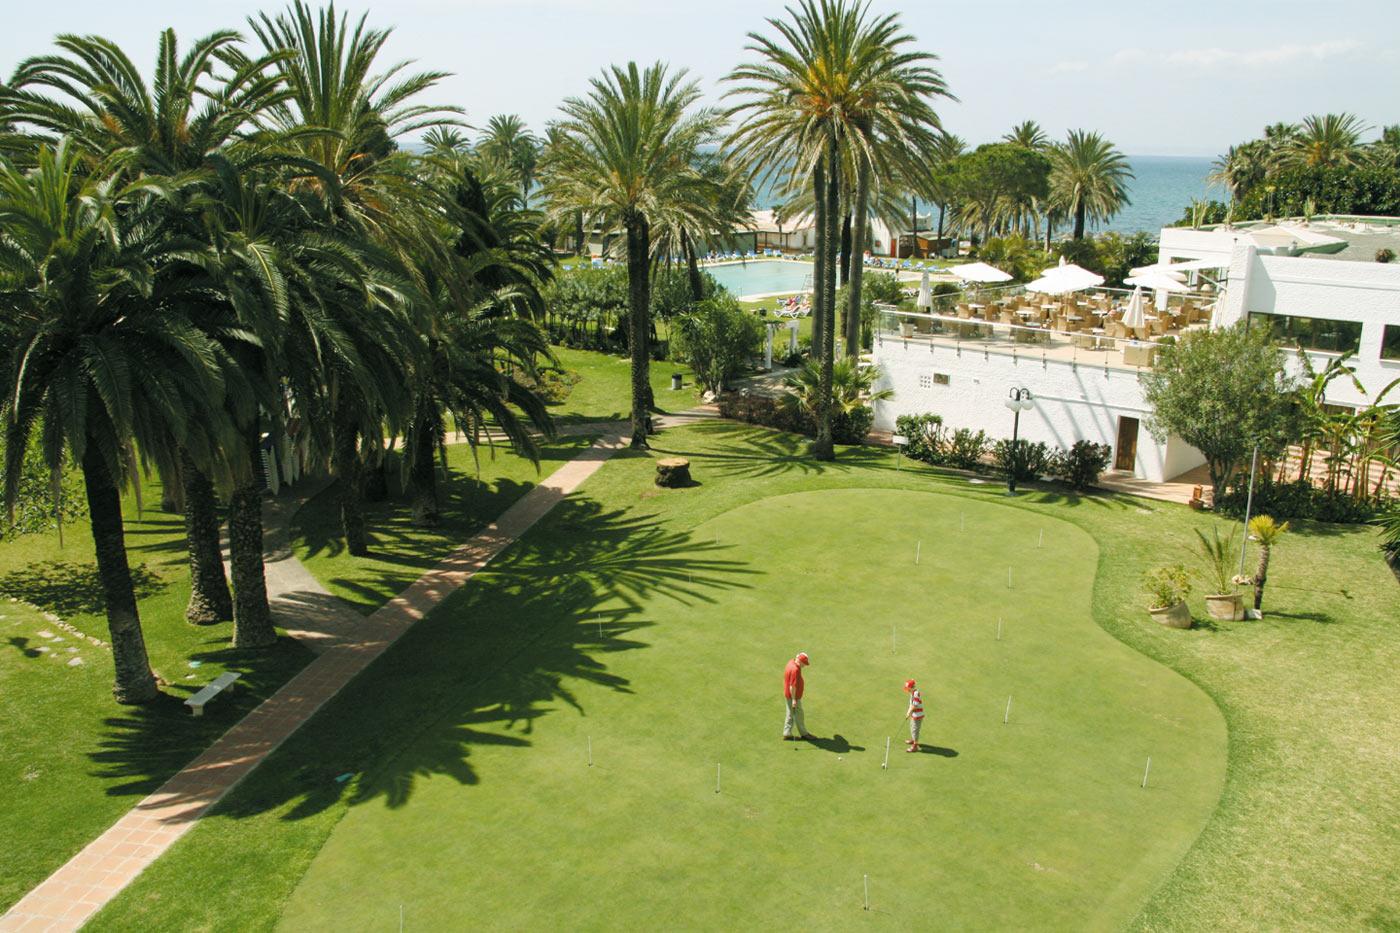 COSTA DEL SOL - 4* Sol Marbella Estepona Atalaya Park